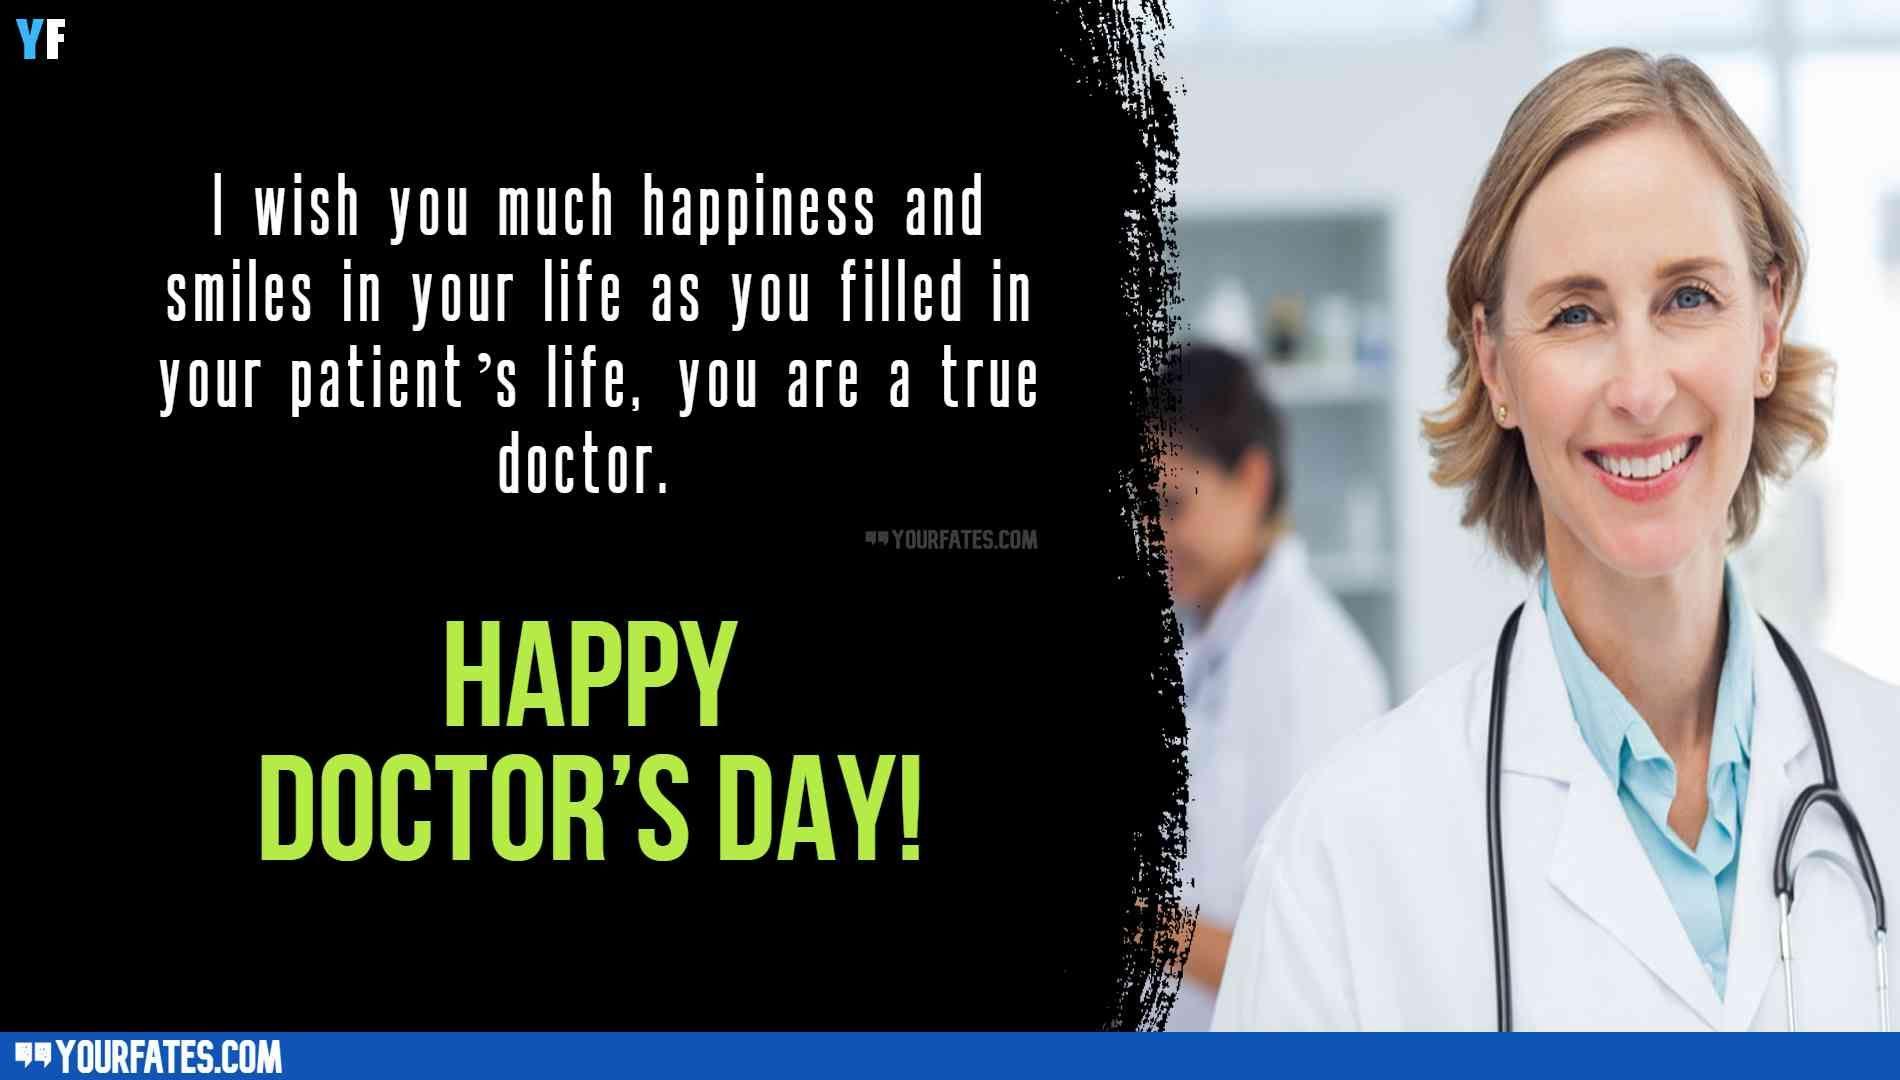 Https Www Yourfates Com Happy Doctors Day Quotes Doctors Day Quotes Doctors Day Happy Doctors Day